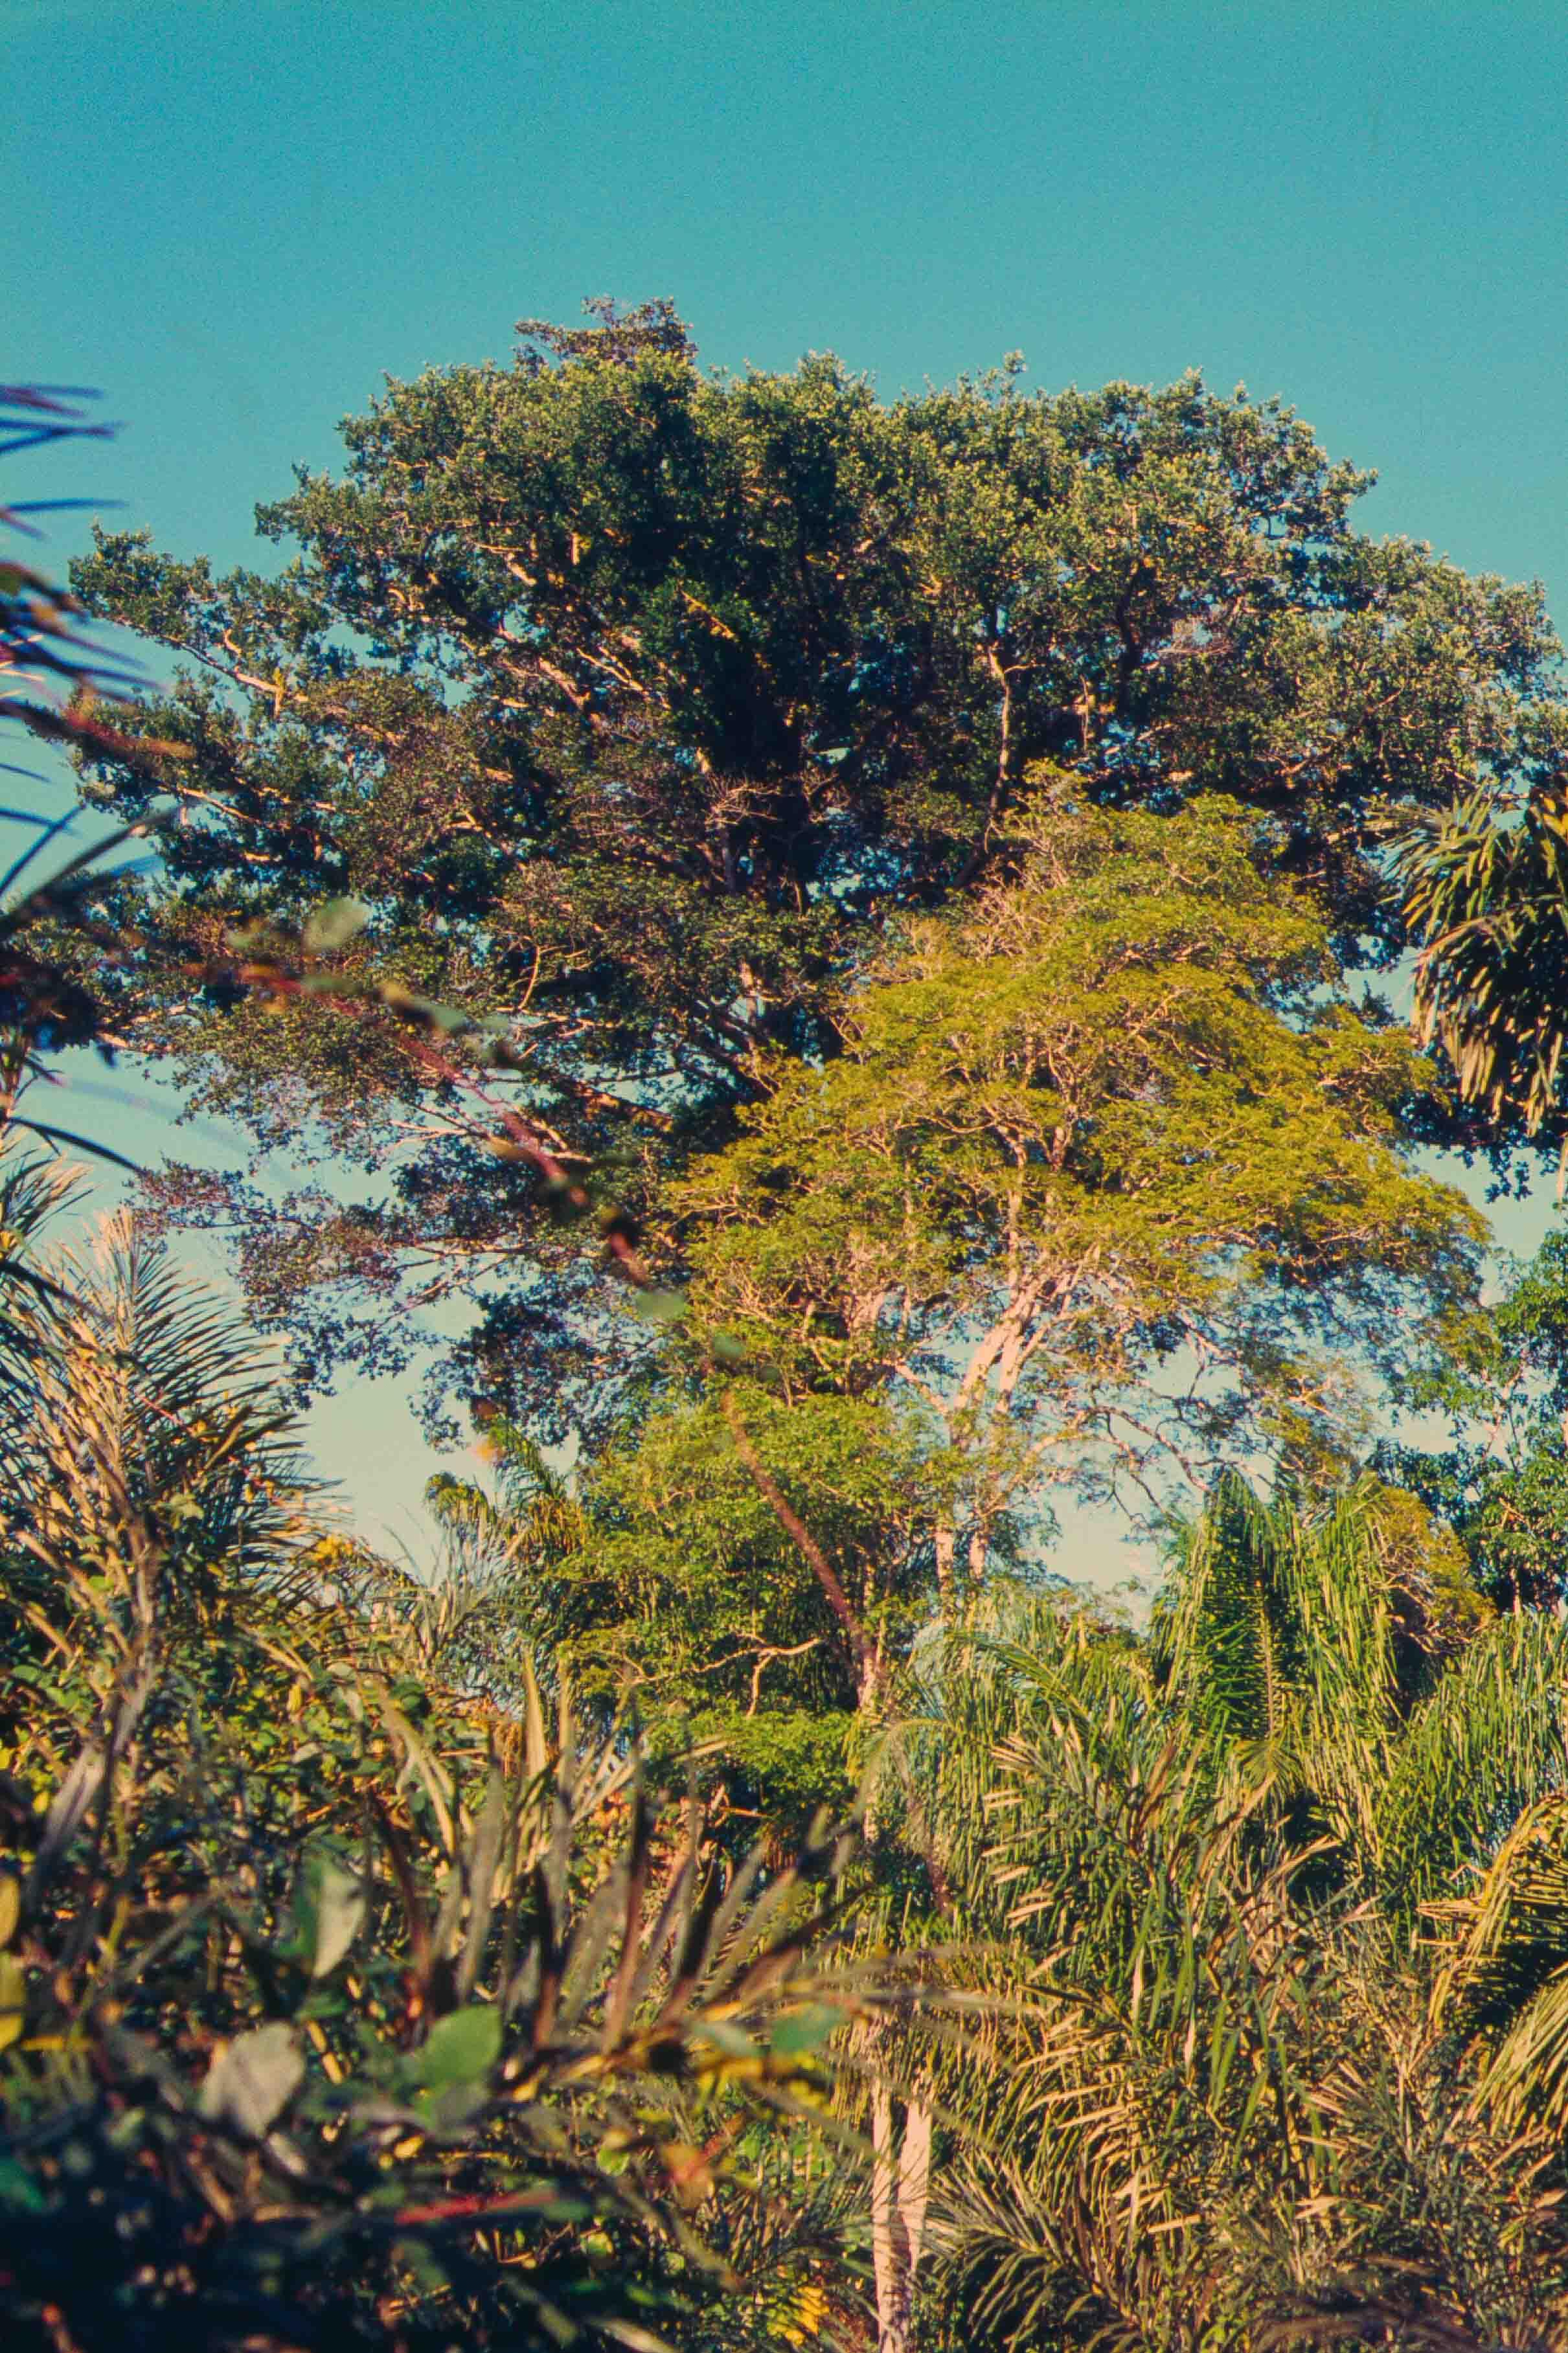 543. Suriname